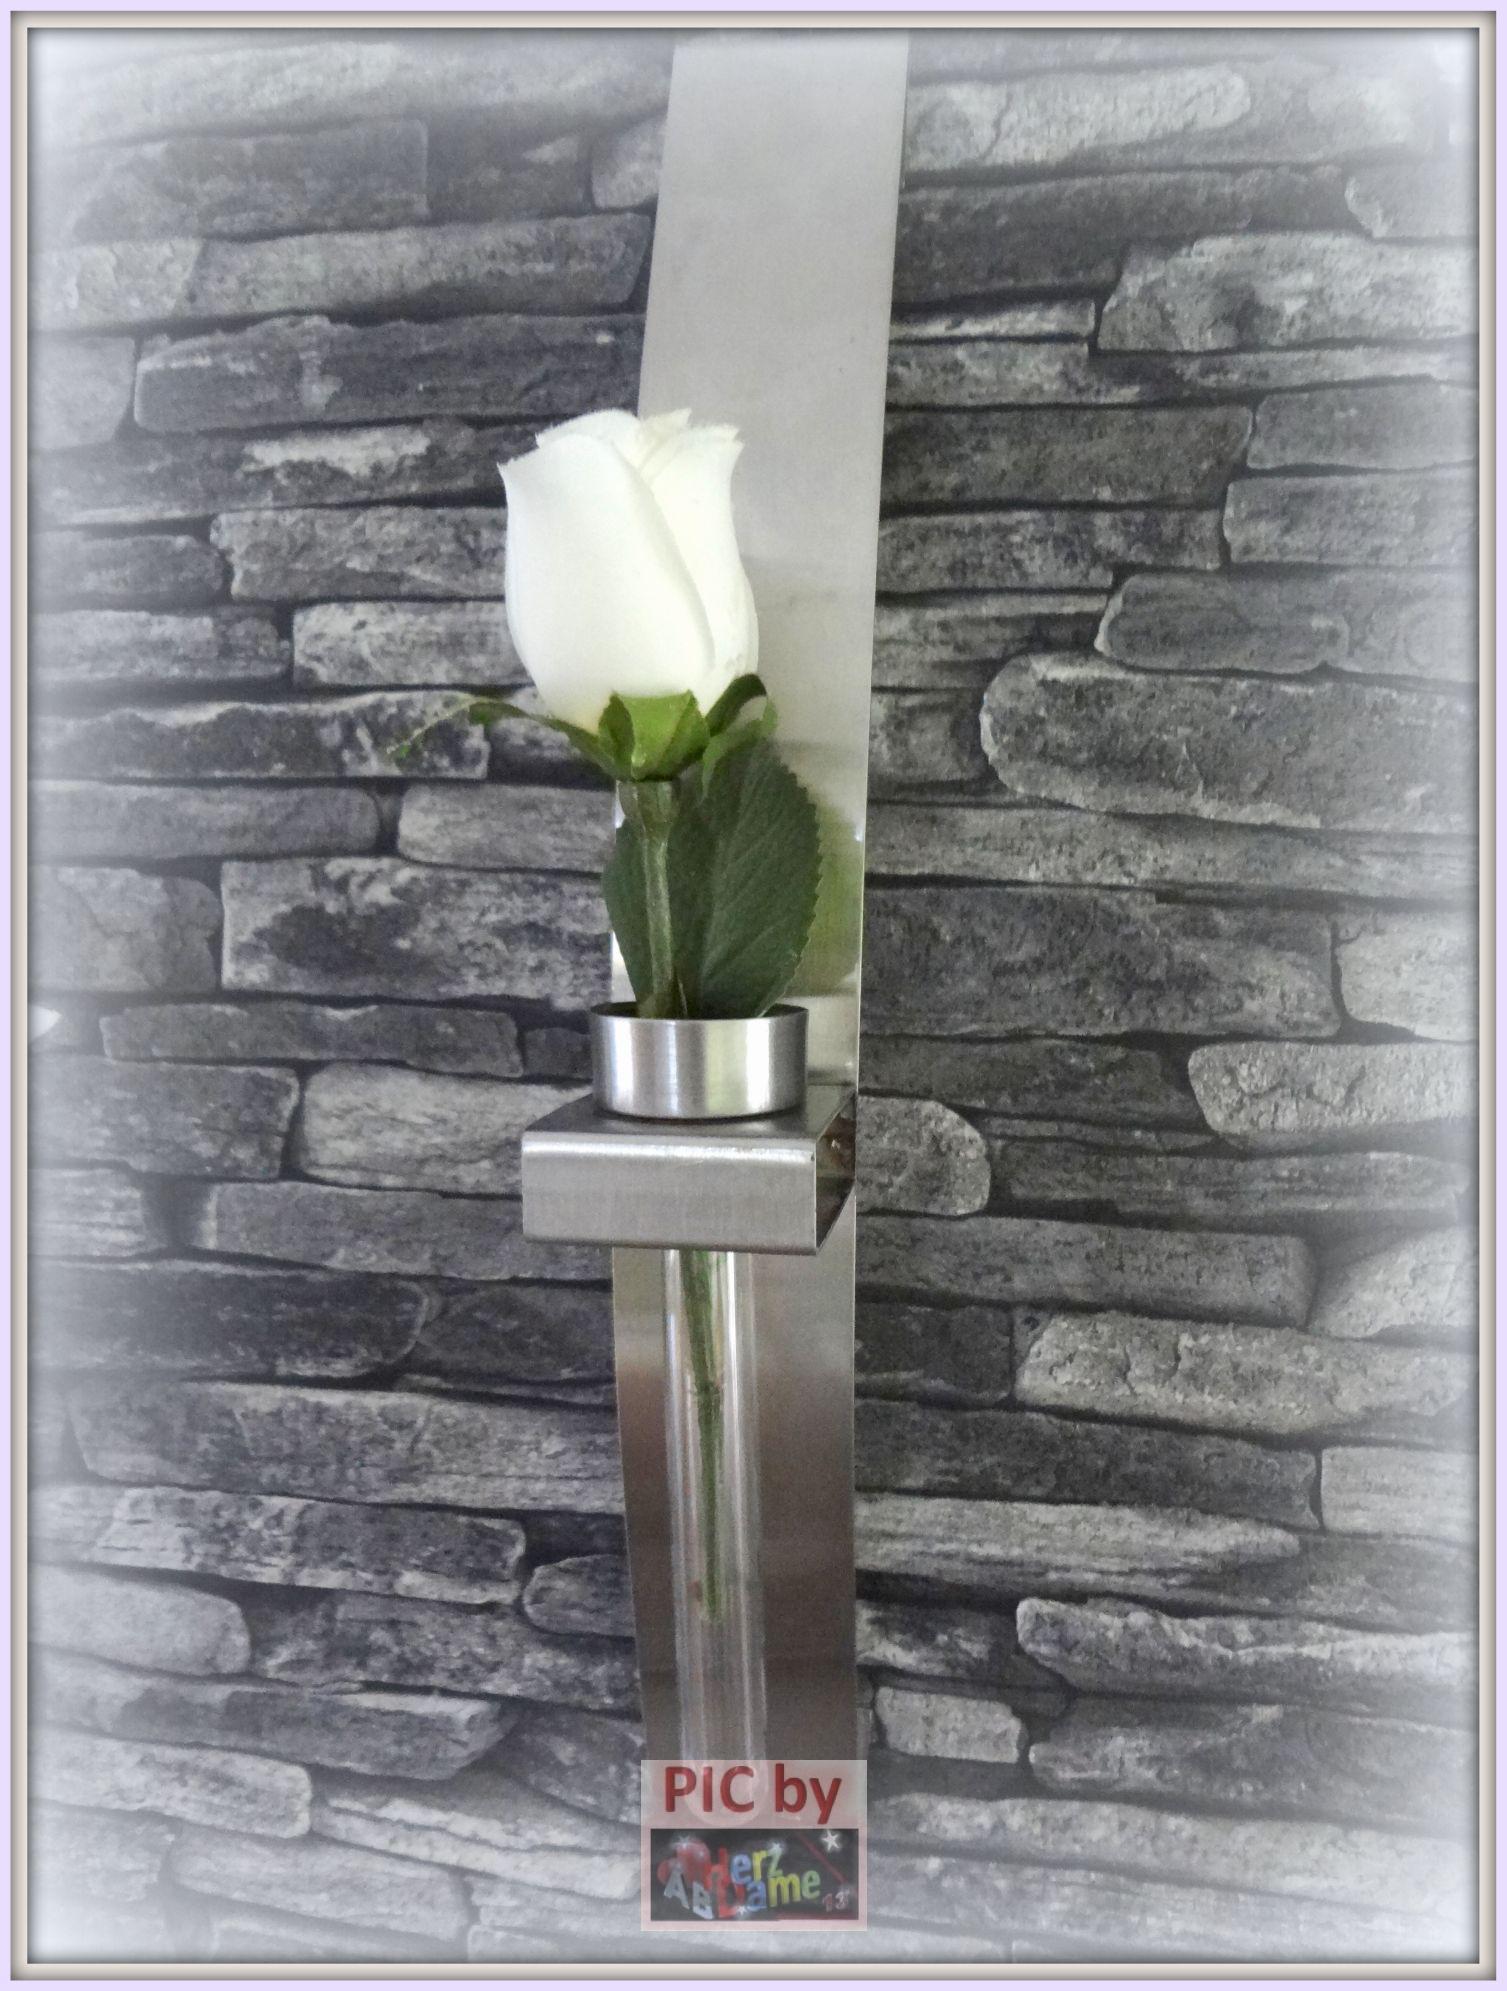 ab691 twin deko teelichthalter 2er vase wand edler stahl. Black Bedroom Furniture Sets. Home Design Ideas